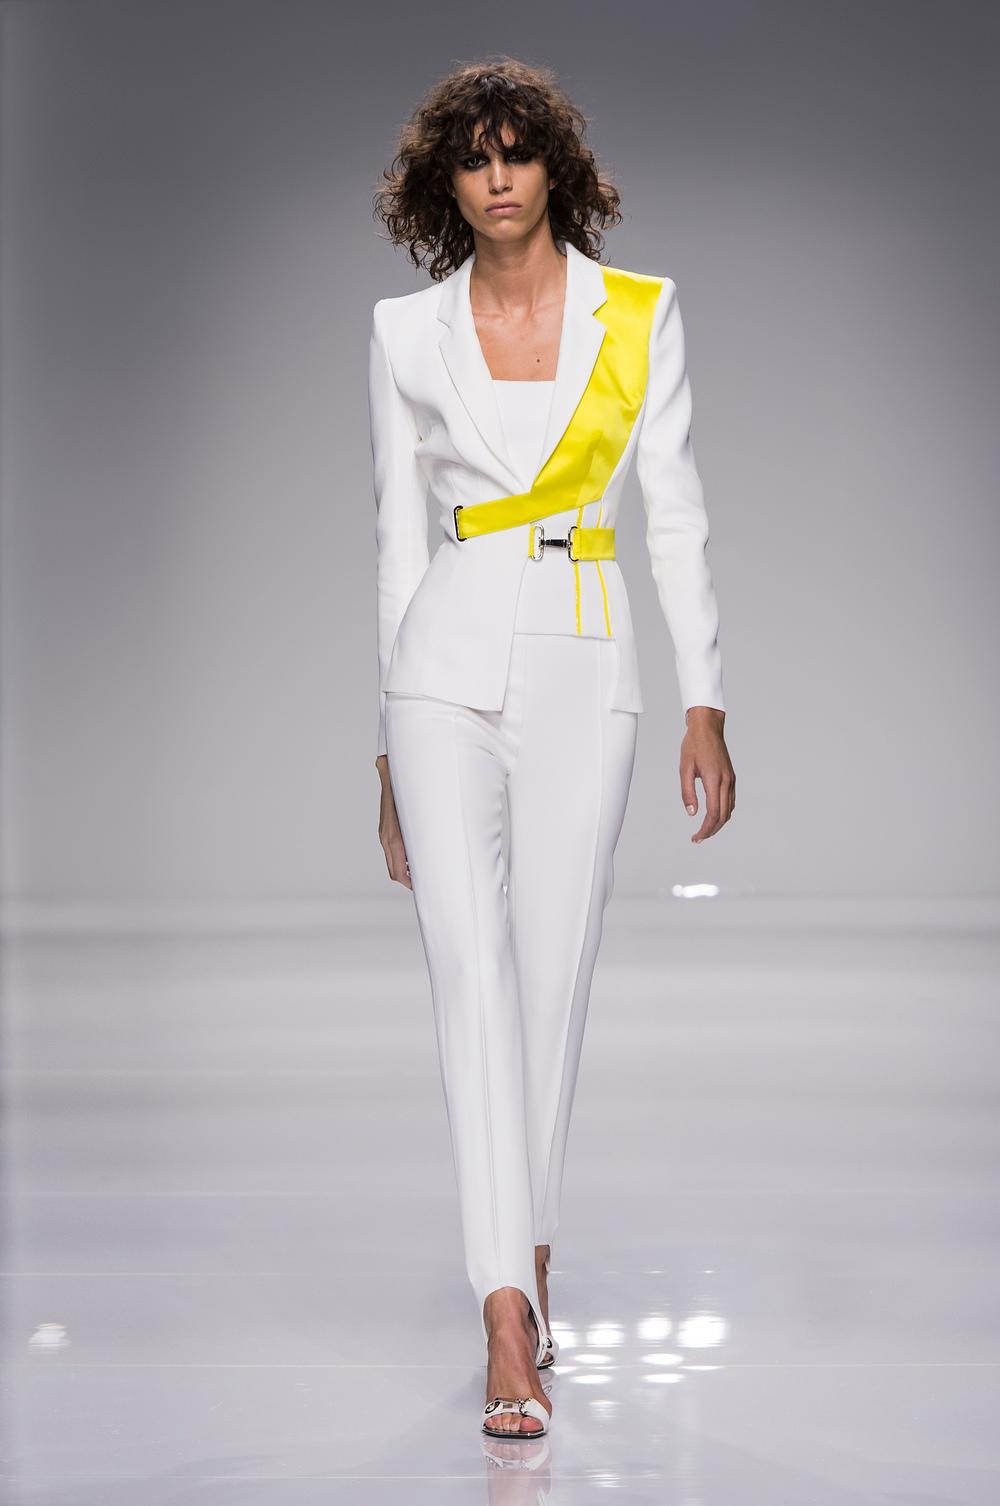 Atelier Versace SS16_Look 3.JPG